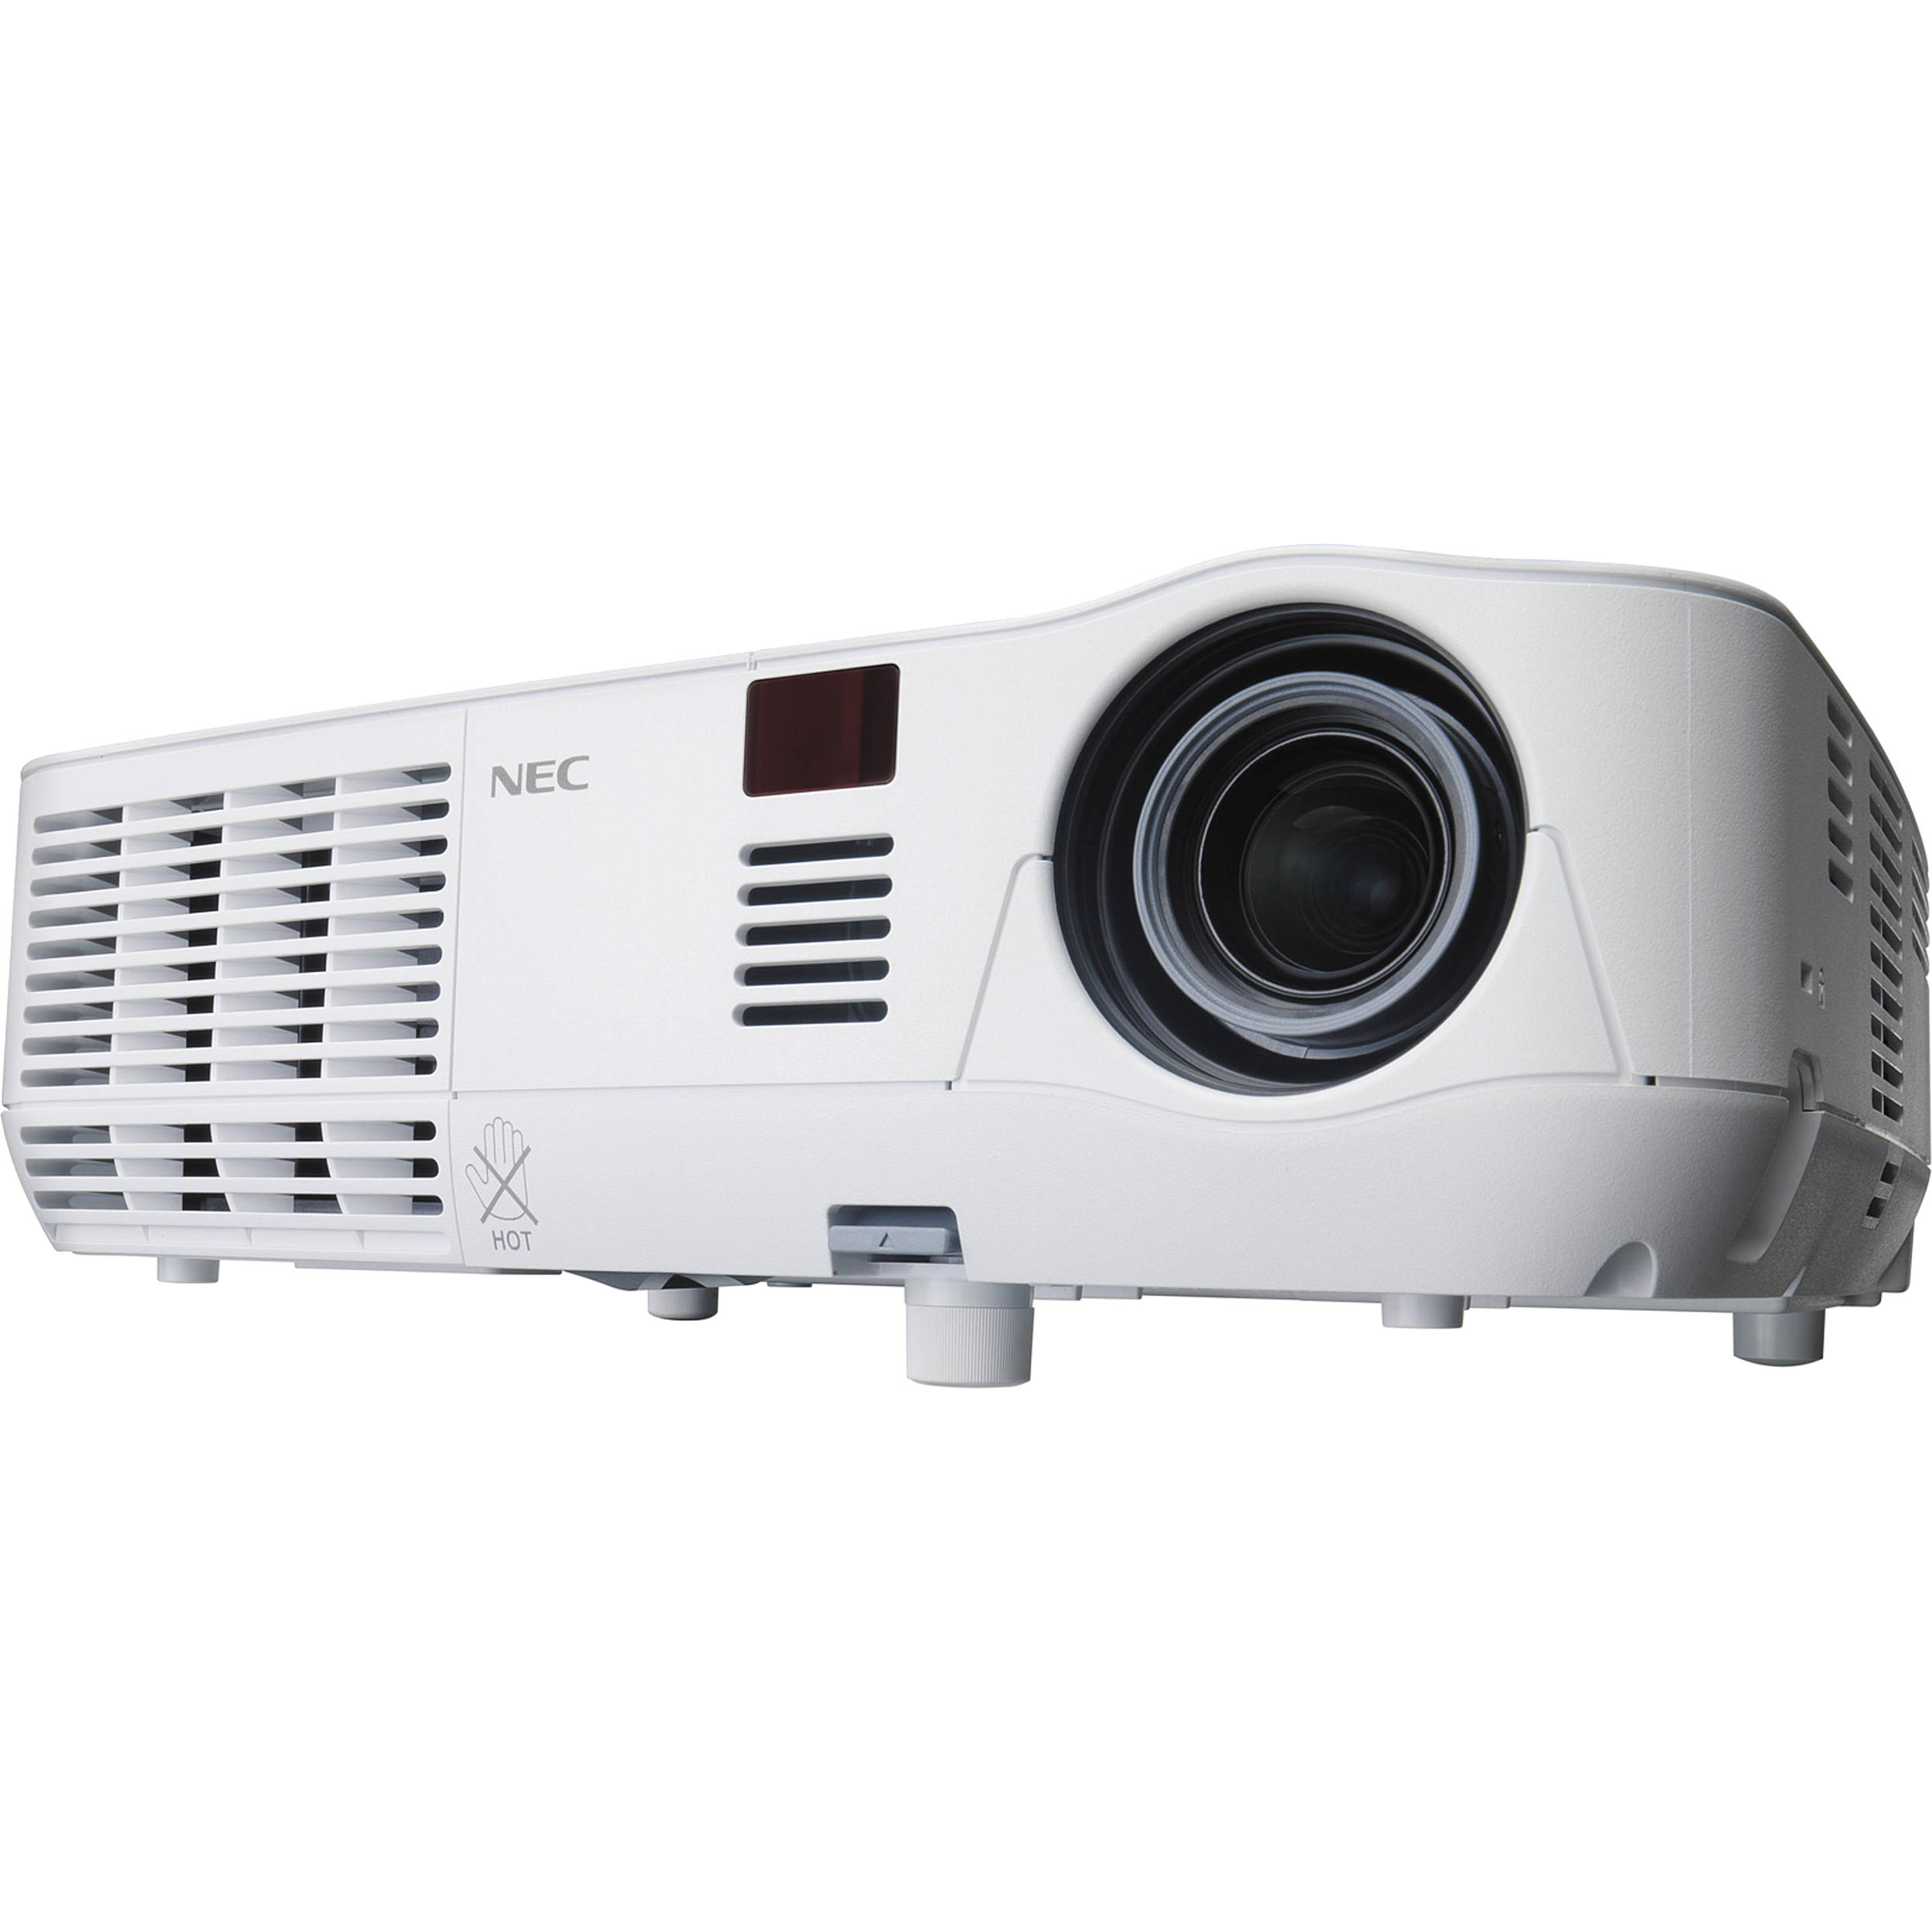 nec np v260x xga 3d mobile projector np v260x b h photo video rh bhphotovideo com Old NEC Projectors NEC Overhead Projector